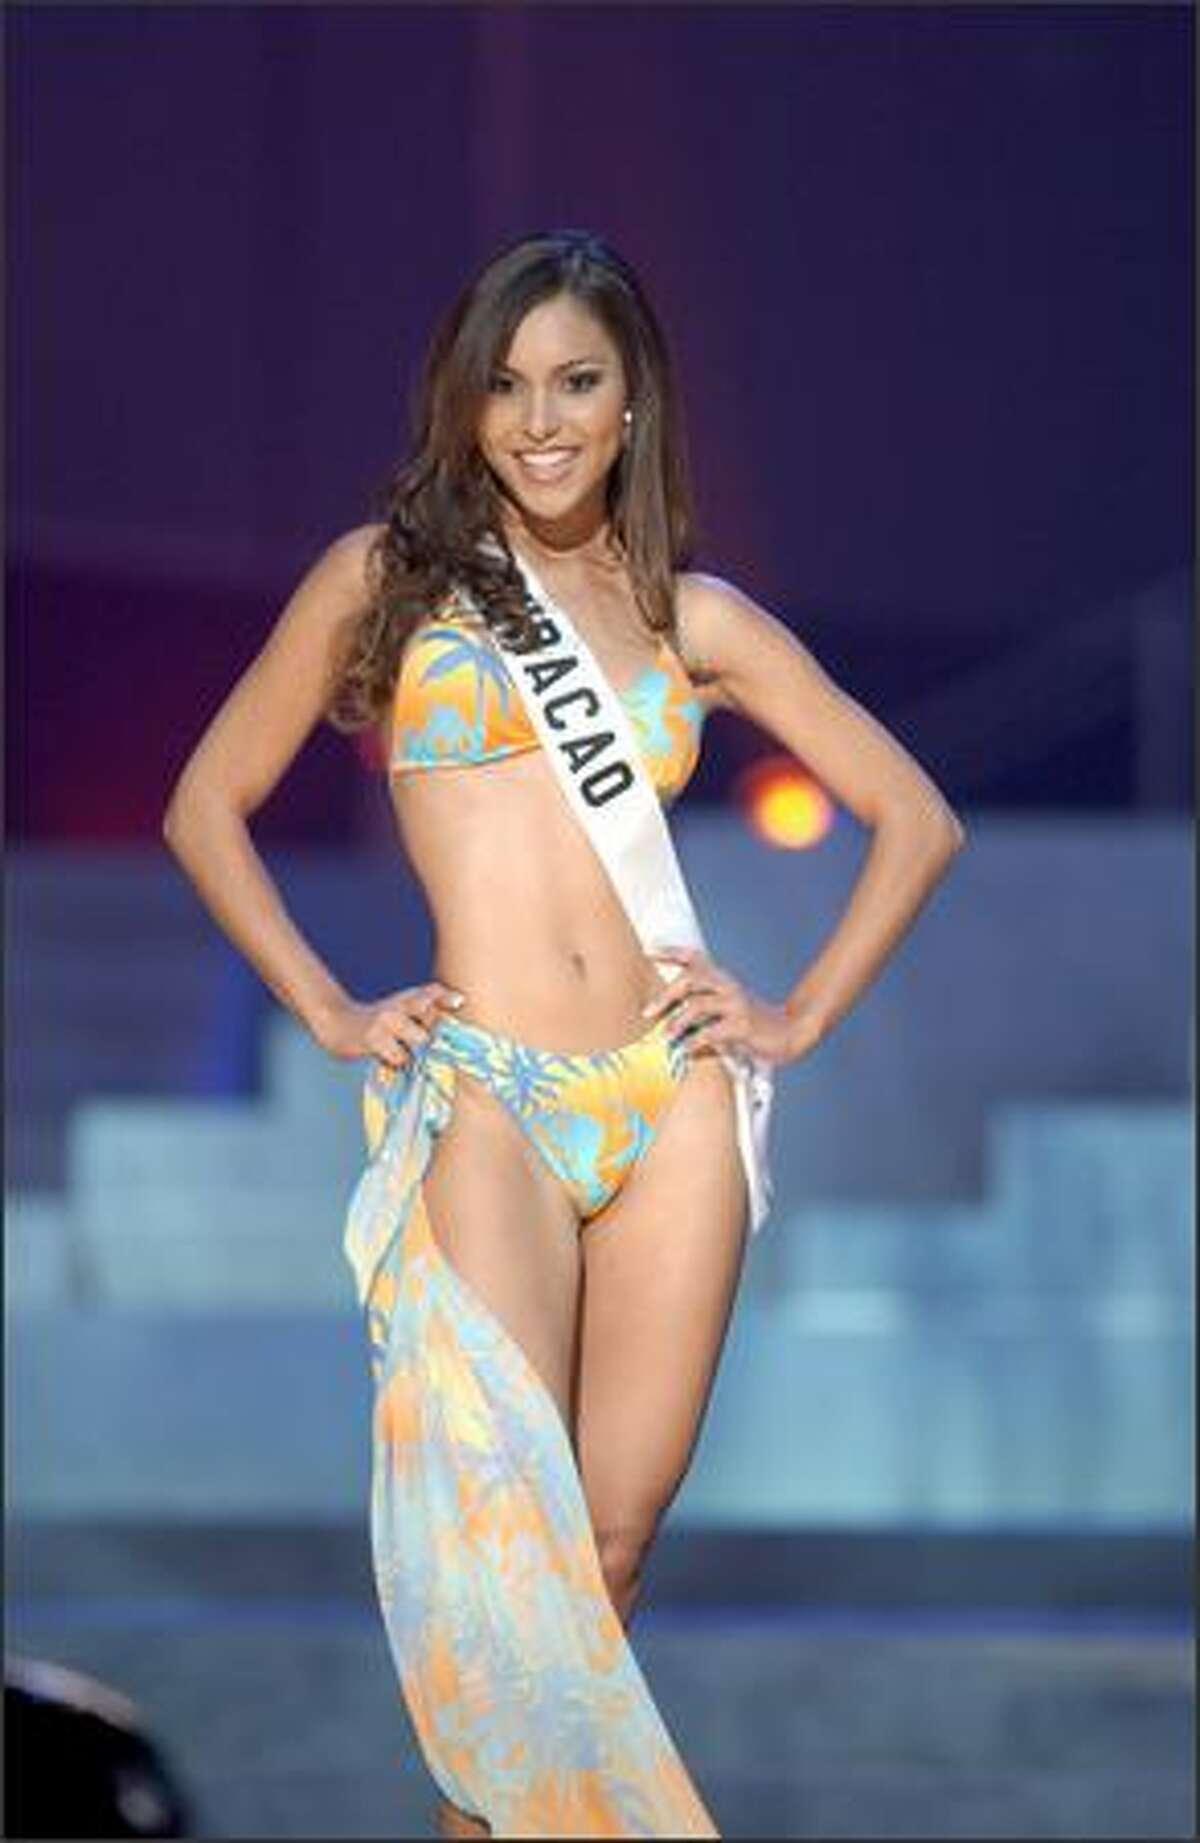 Angeline da Silva de Goes, Miss Curacao.